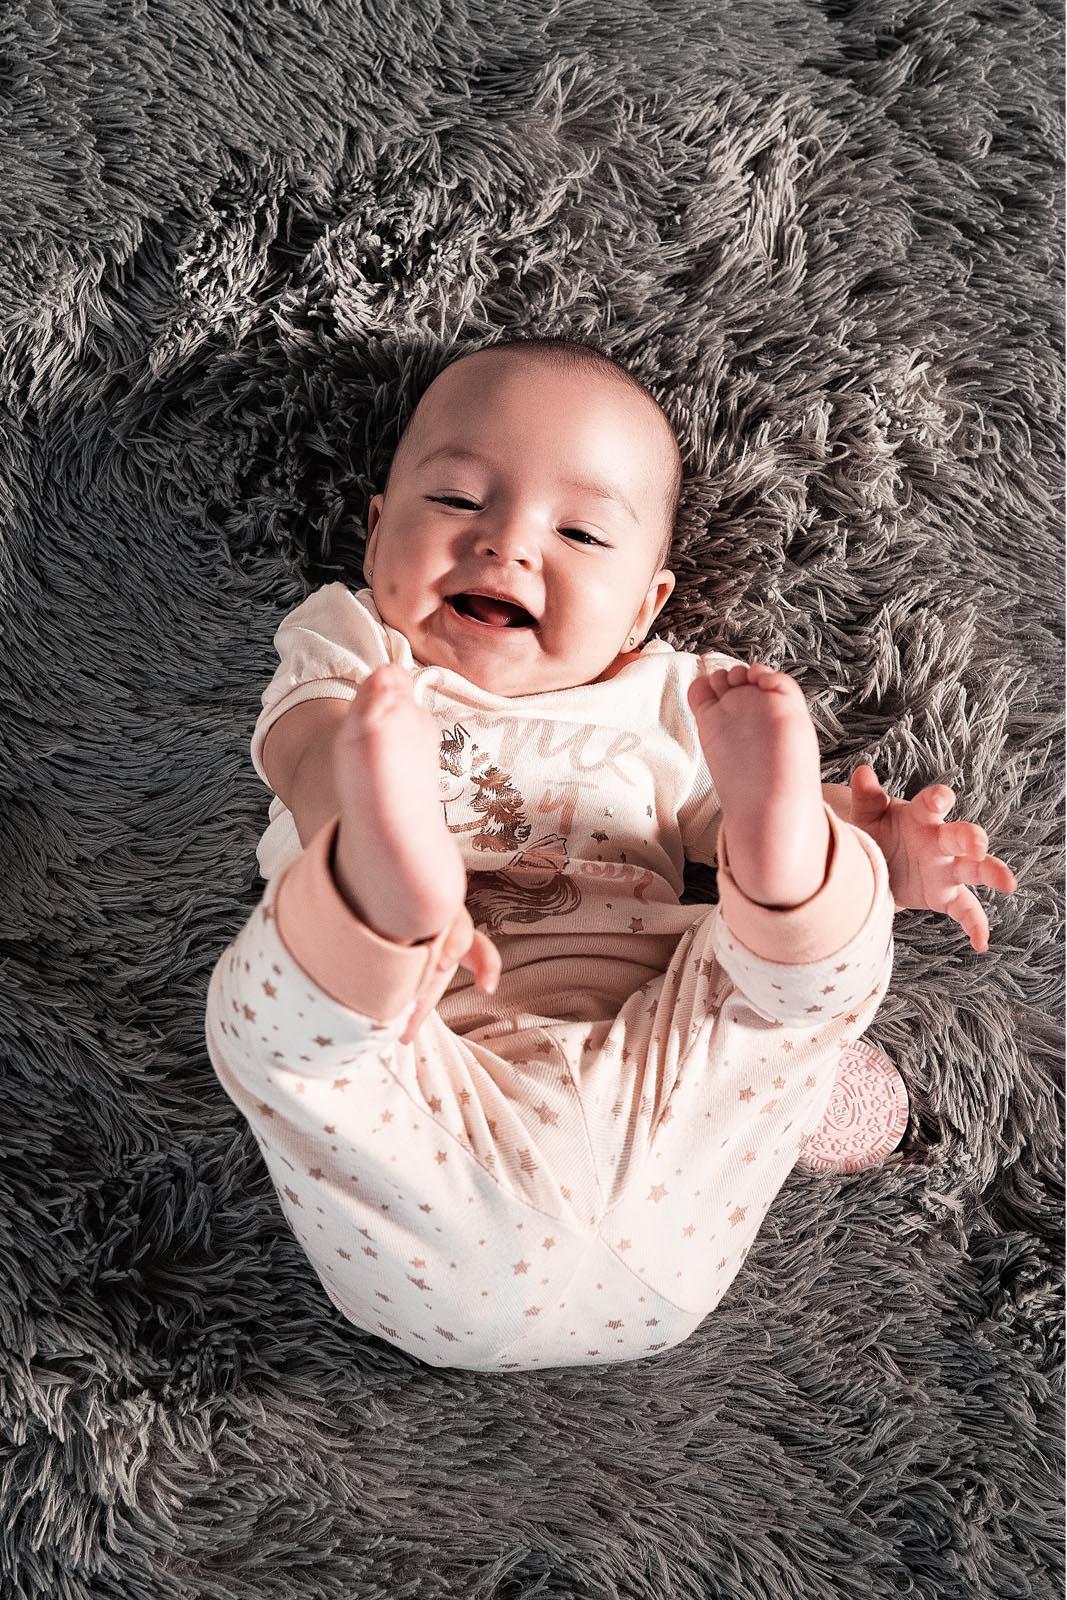 Baby photographer Belfast - cute baby lying on fur carpet photo 3969272